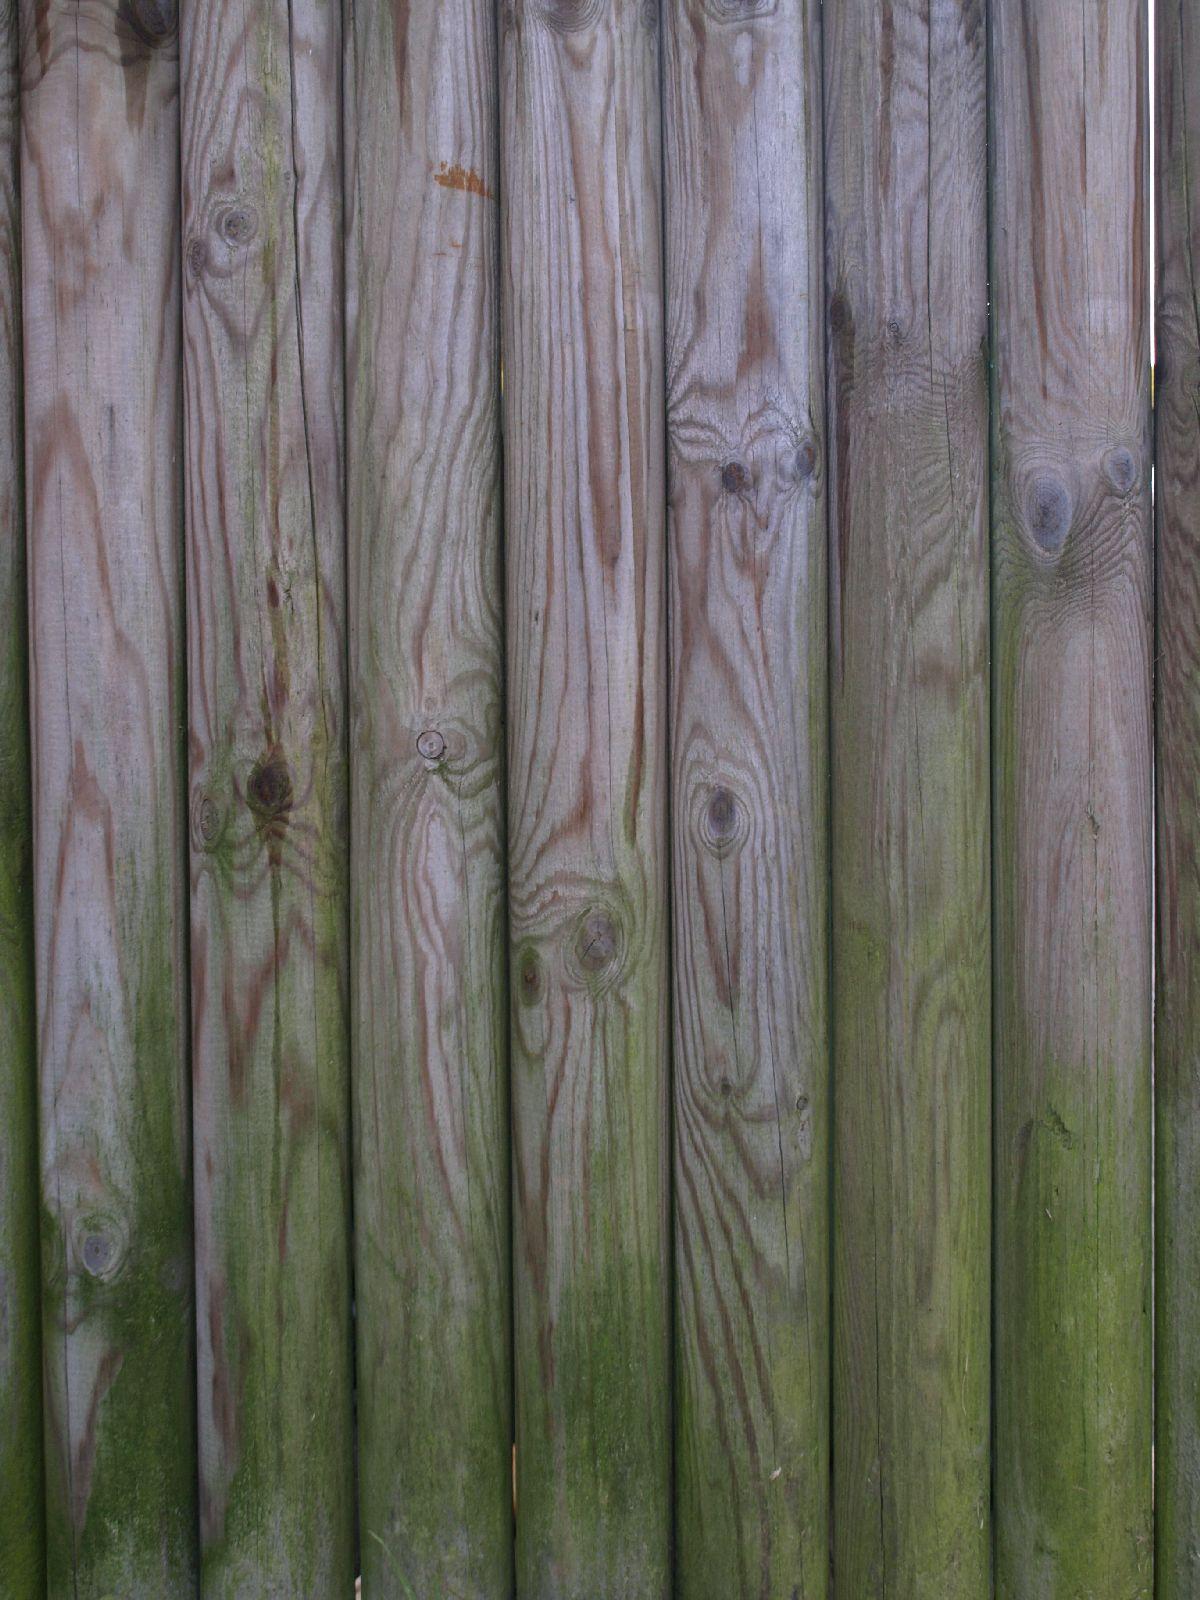 Wood_Texture_A_P1189439